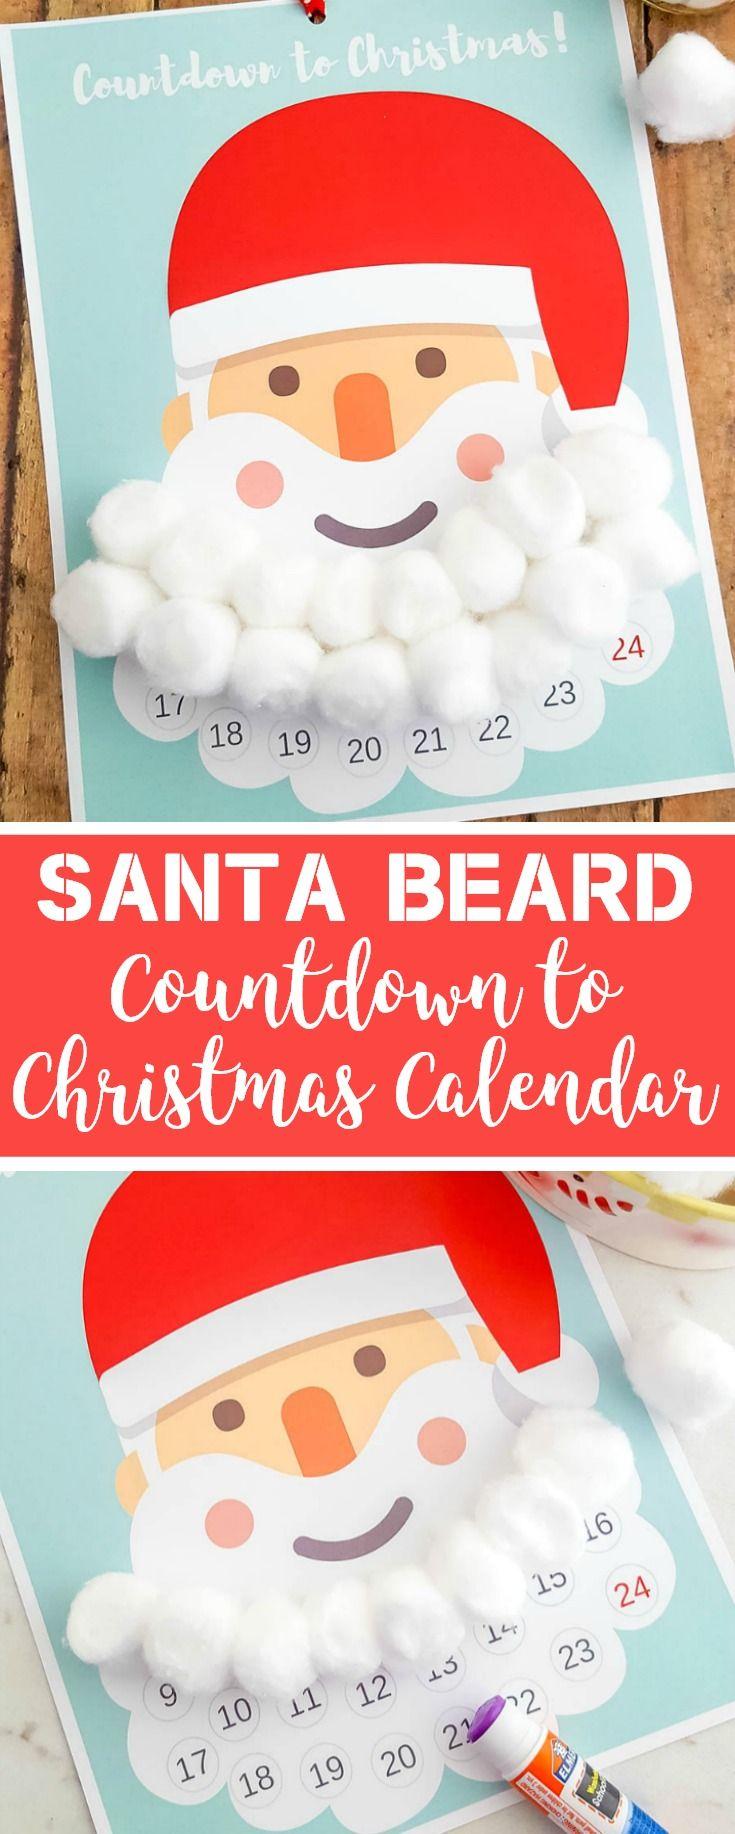 Free Printable Santa Beard Advent Calendar   DIY Countdown to Christmas Calendar #christmascrafts #countdowntochristmas